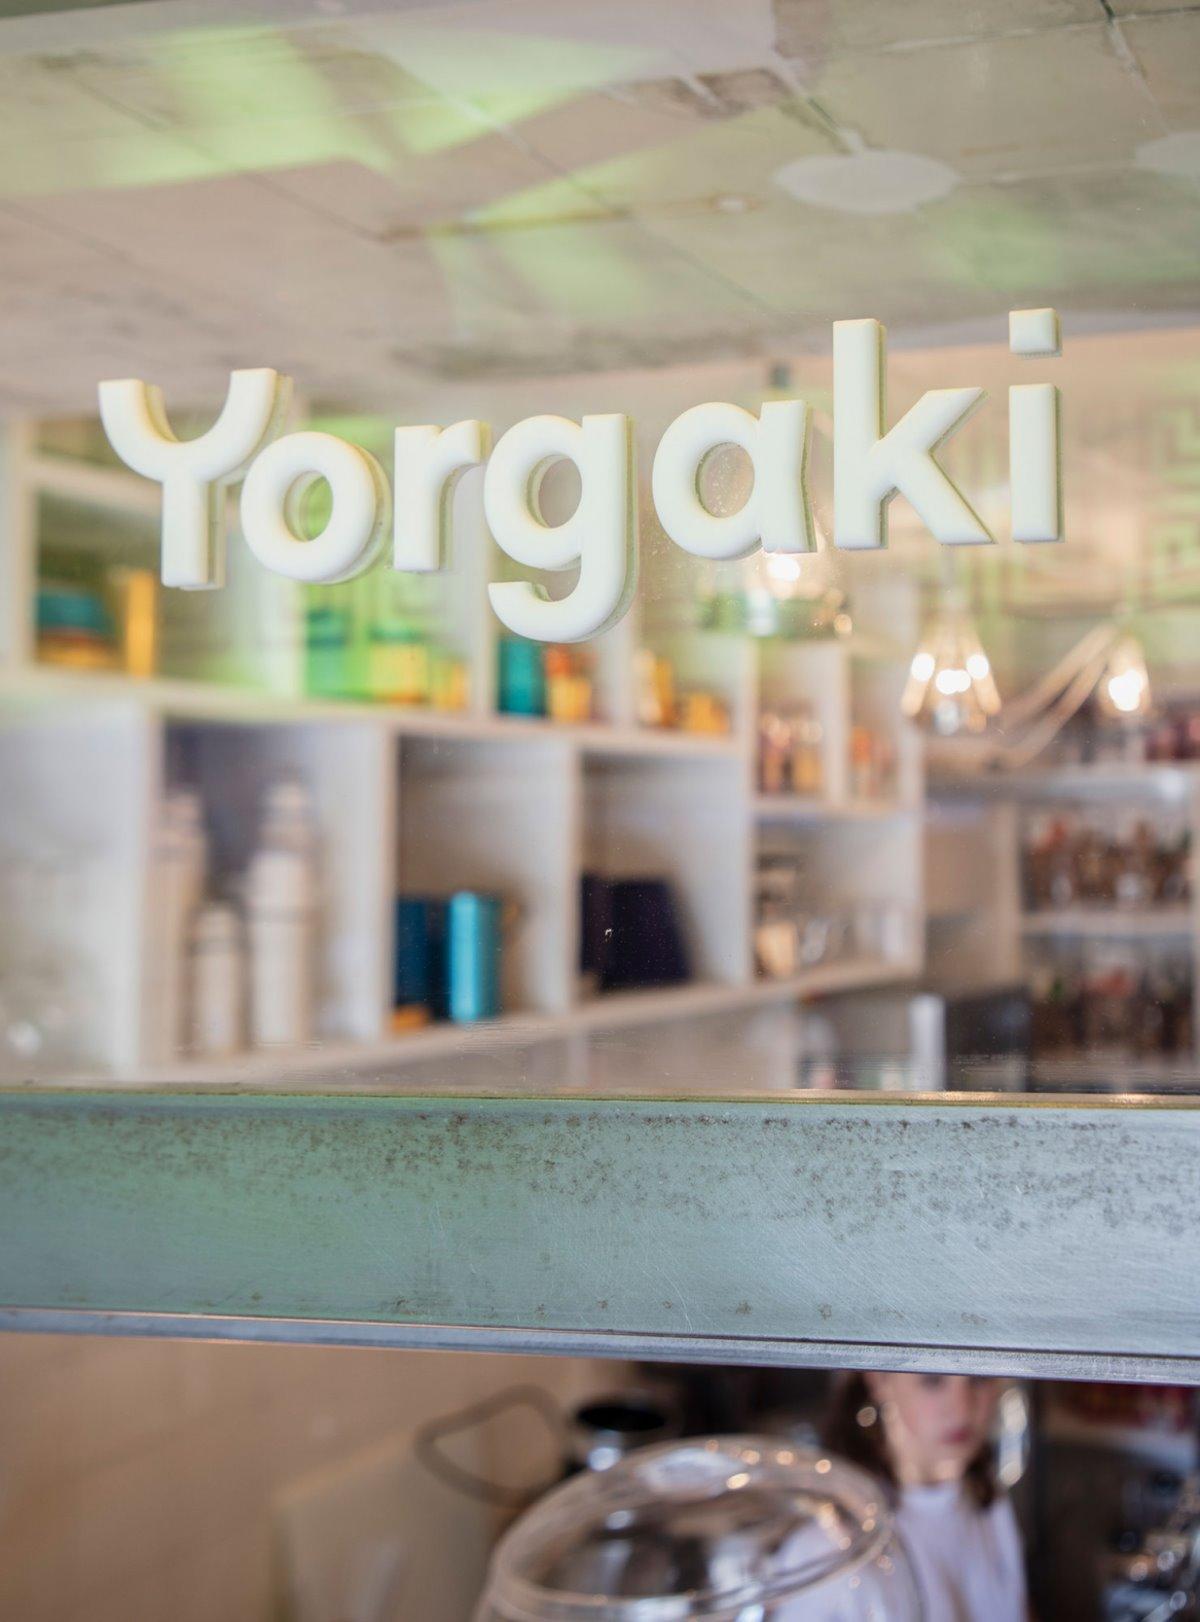 Yorgaki καφέ στο παρίσι παραδοσιακός ελληνικός καφές είσοδος